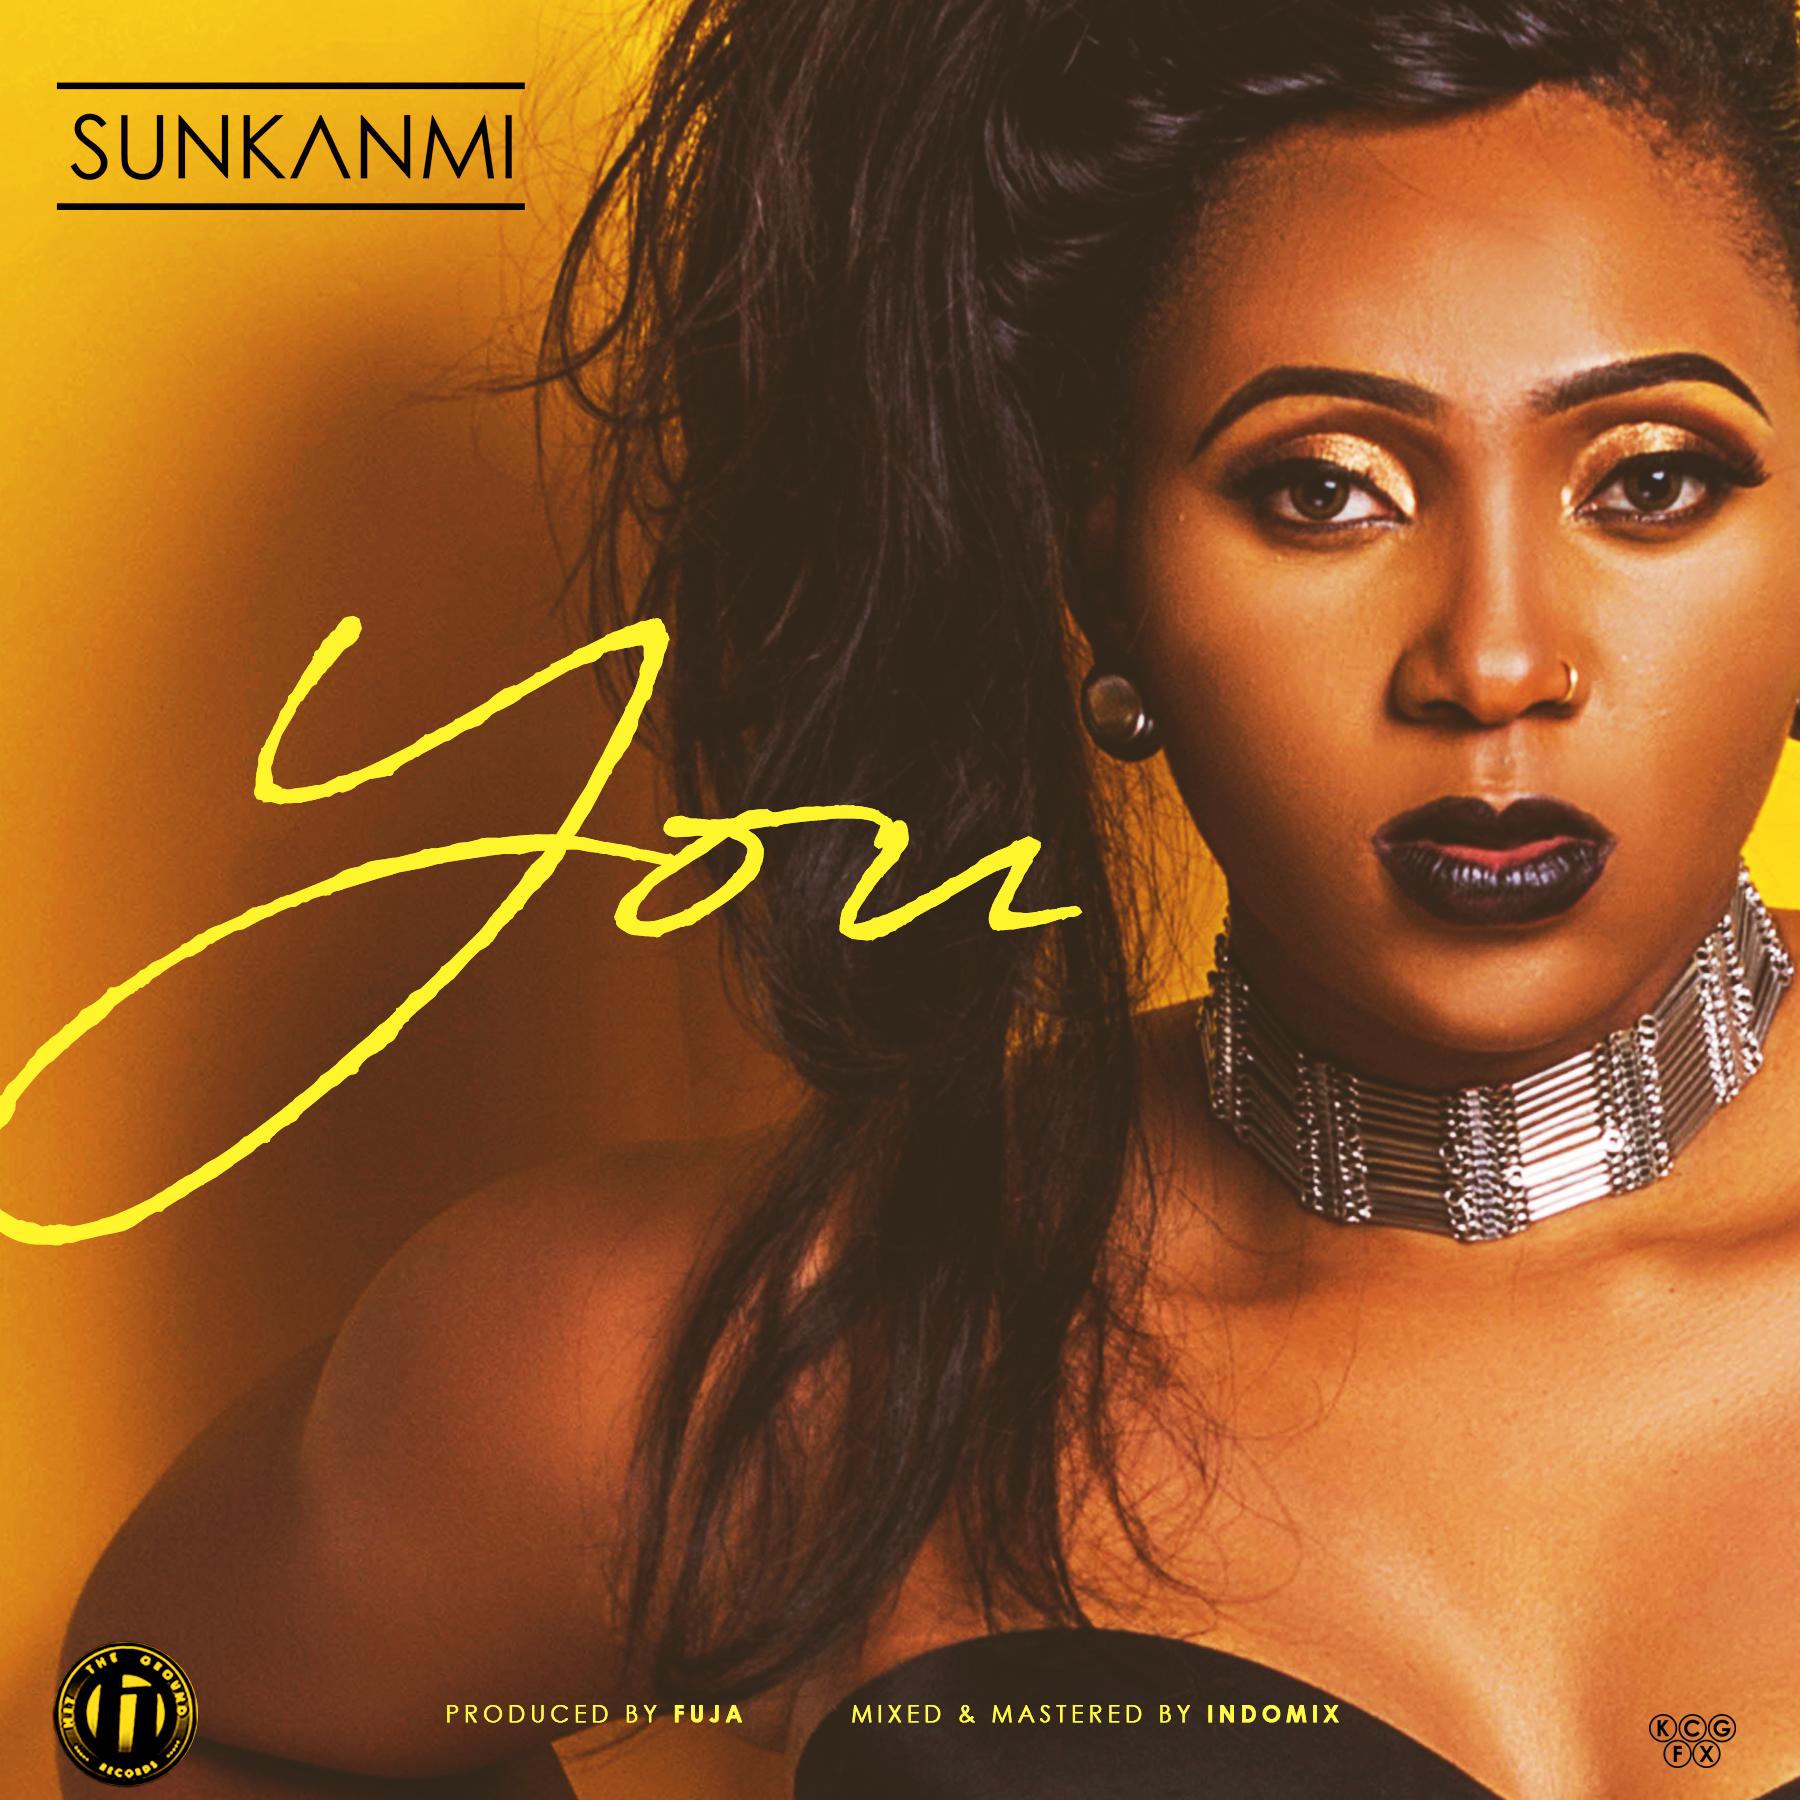 VIDEO: Sunkanmi – You